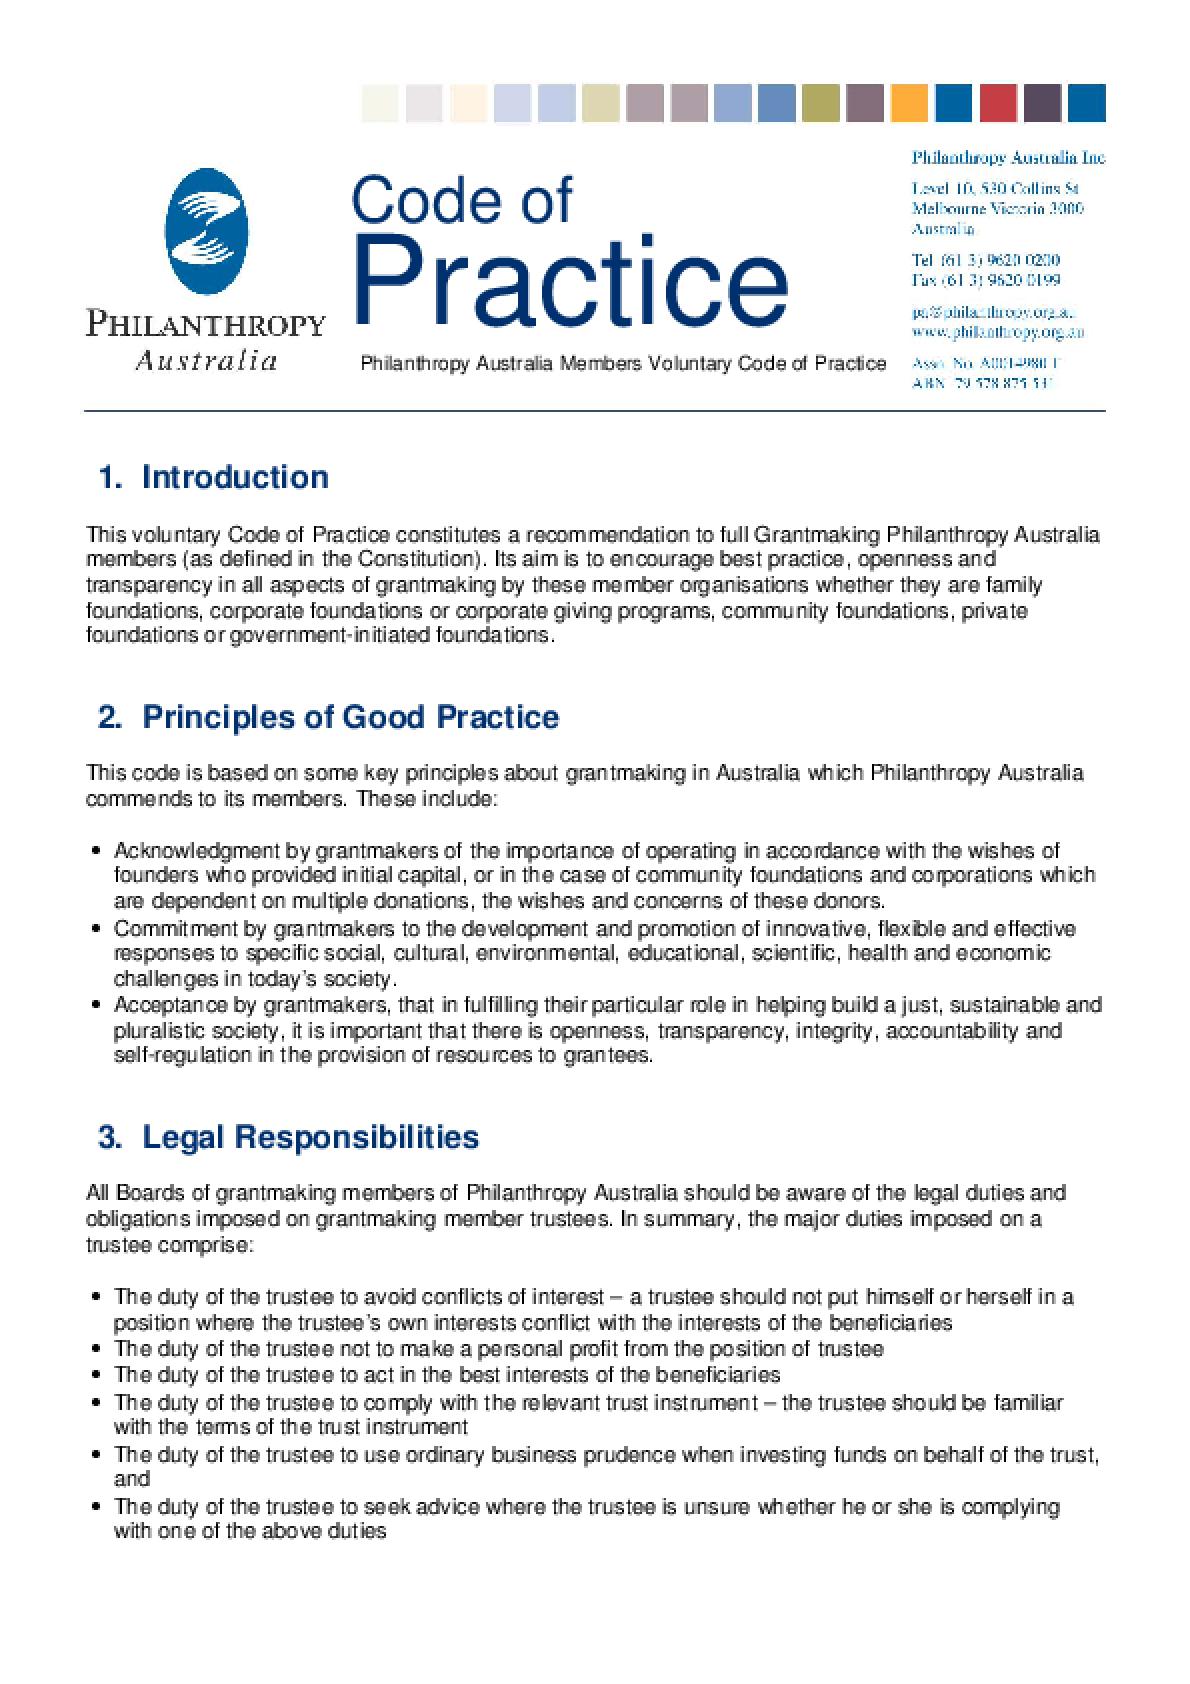 Philanthropy Australia. Code of Practice